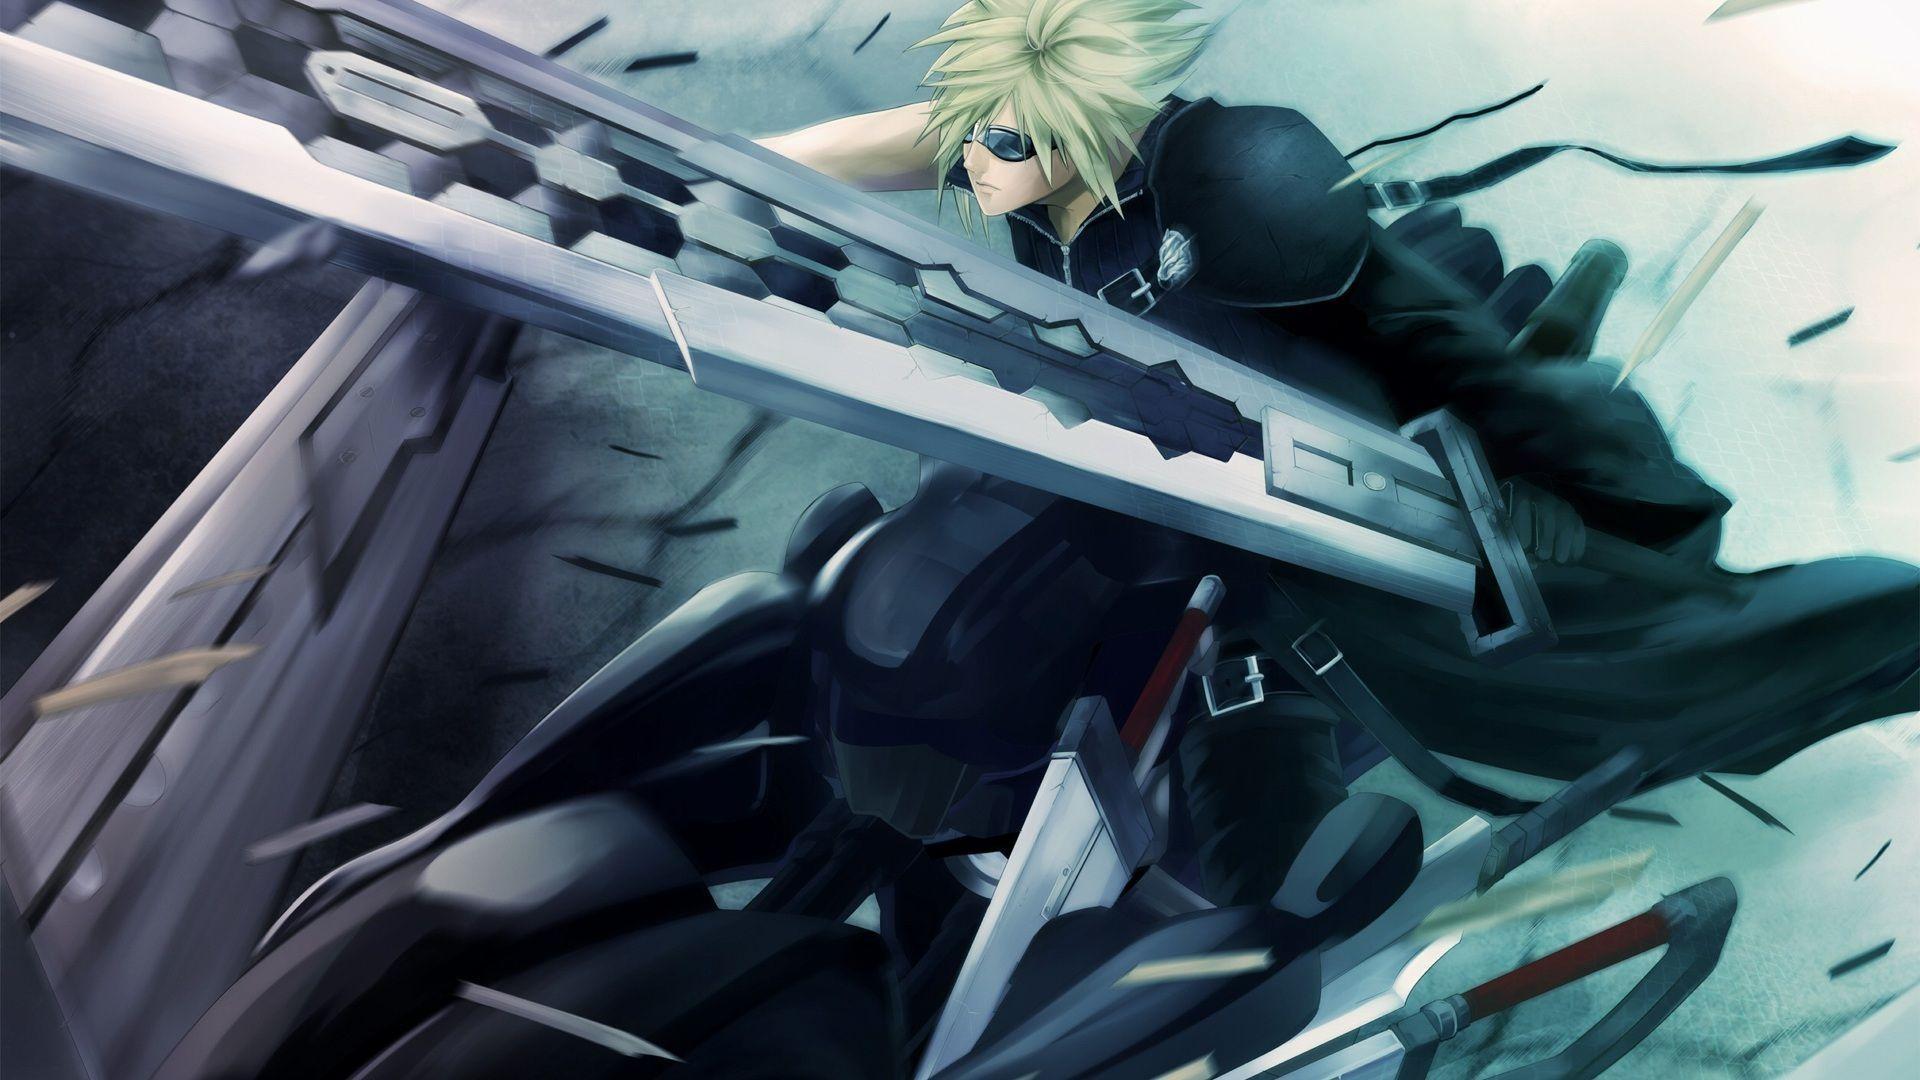 Final-Fantasy-Cloud-Strife-Group-wallpaper-wp2005234